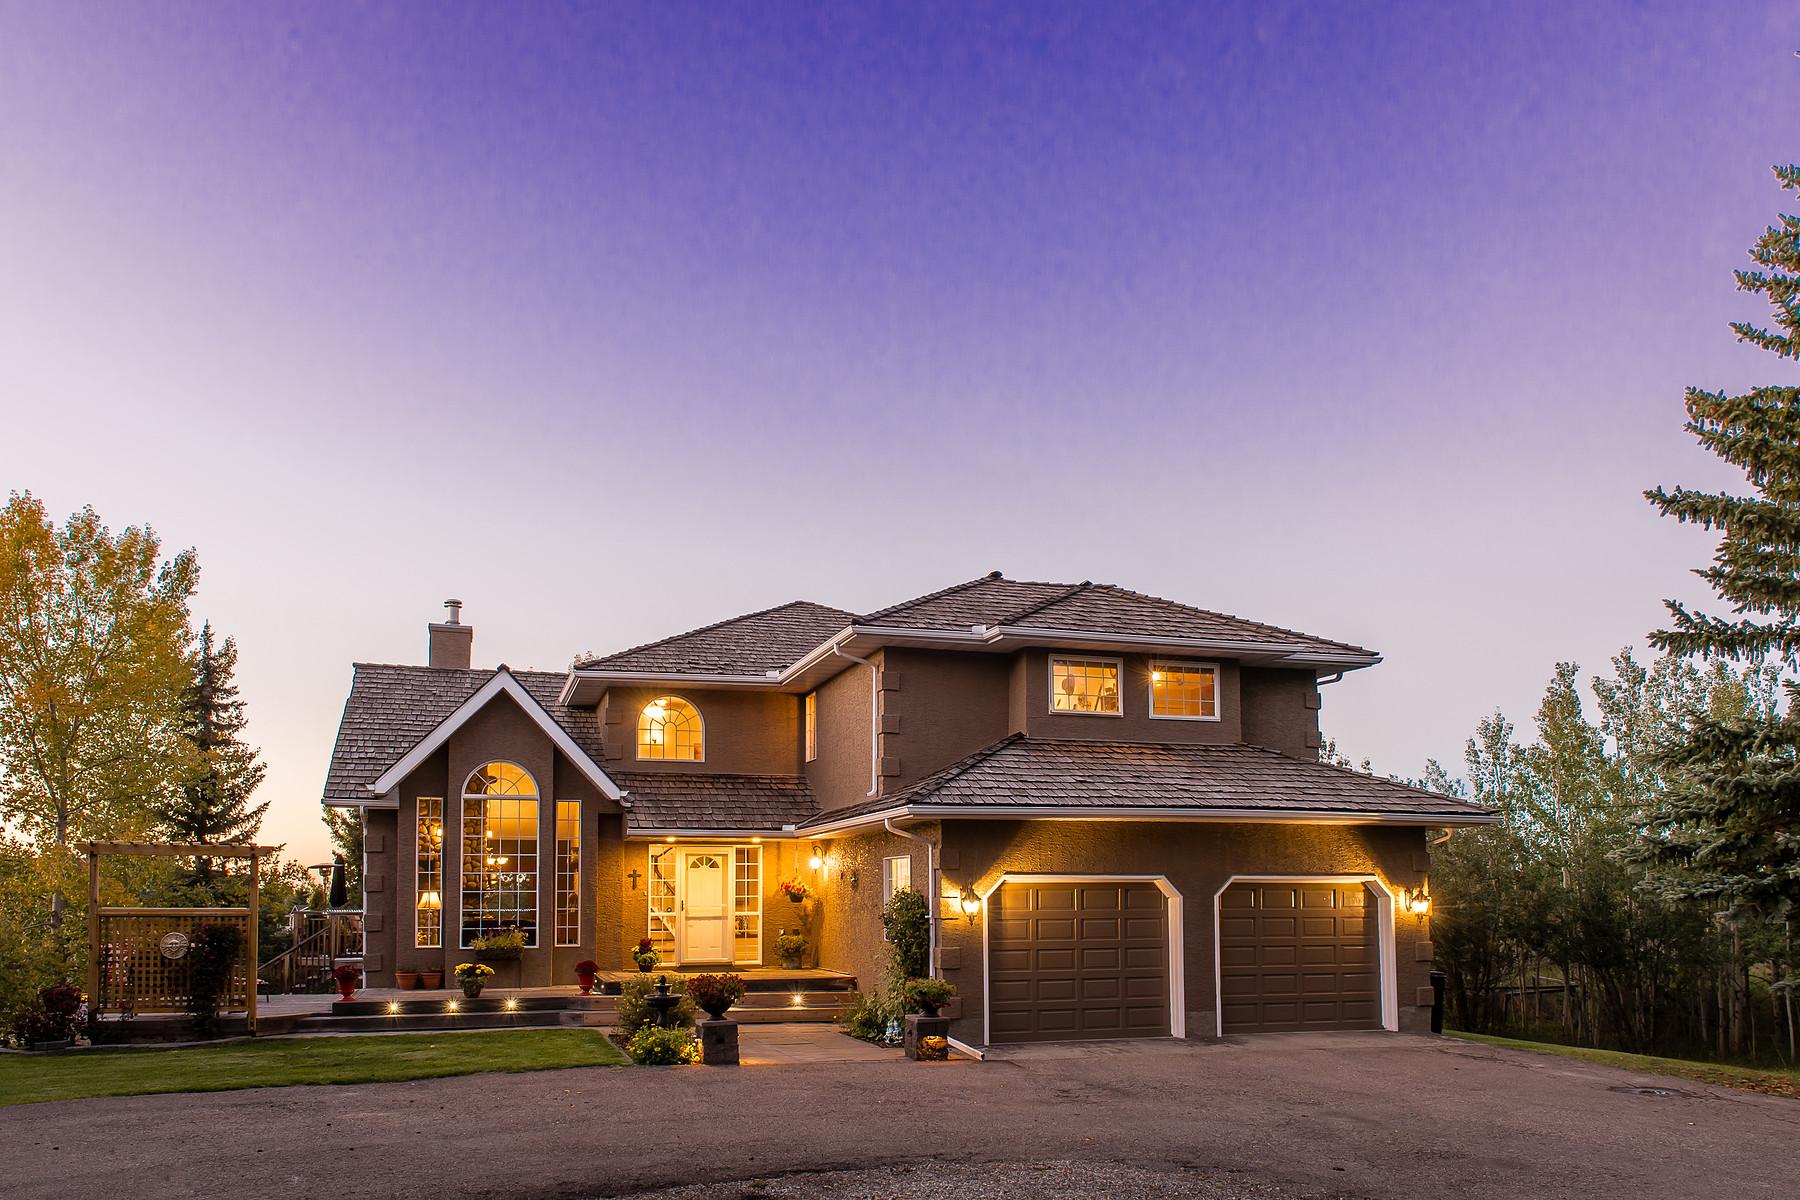 Einfamilienhaus für Verkauf beim Bearspaw Acreage 25204 Burma Road Calgary, Alberta, T3R 1B7 Kanada